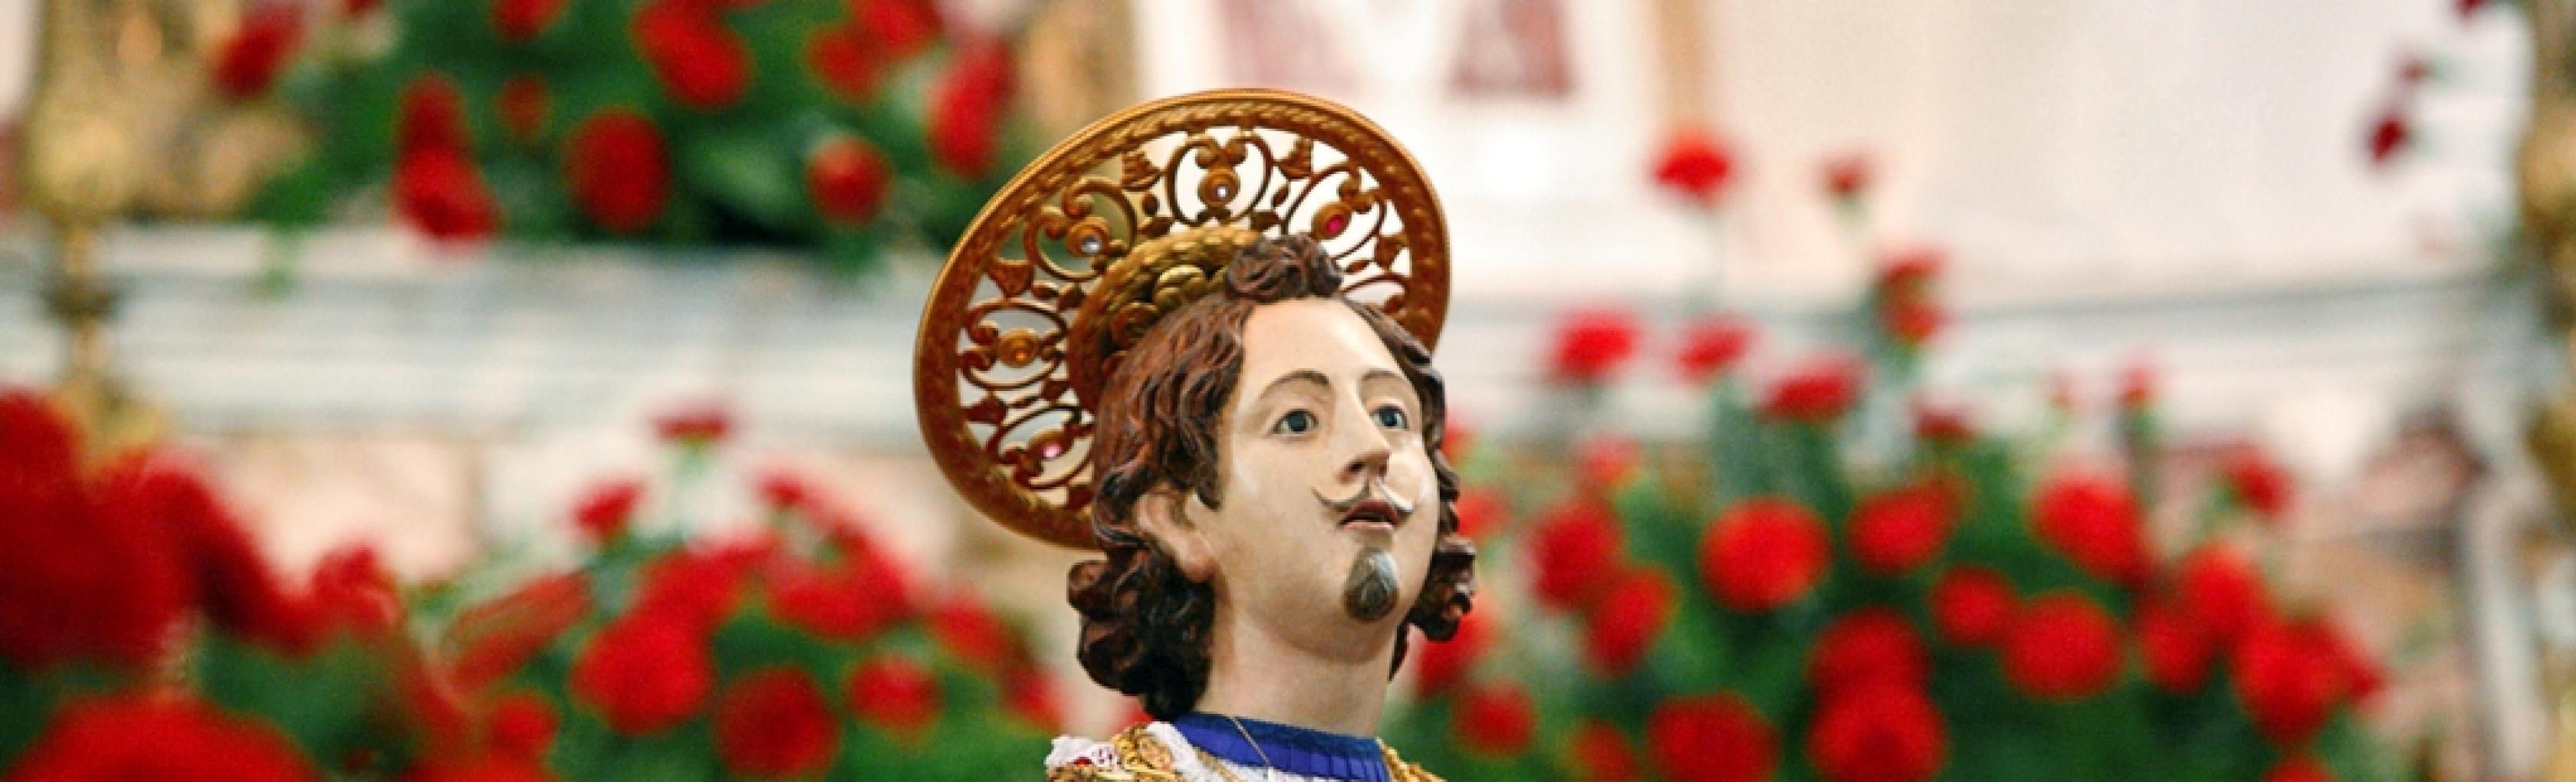 statua di sant'Efisio